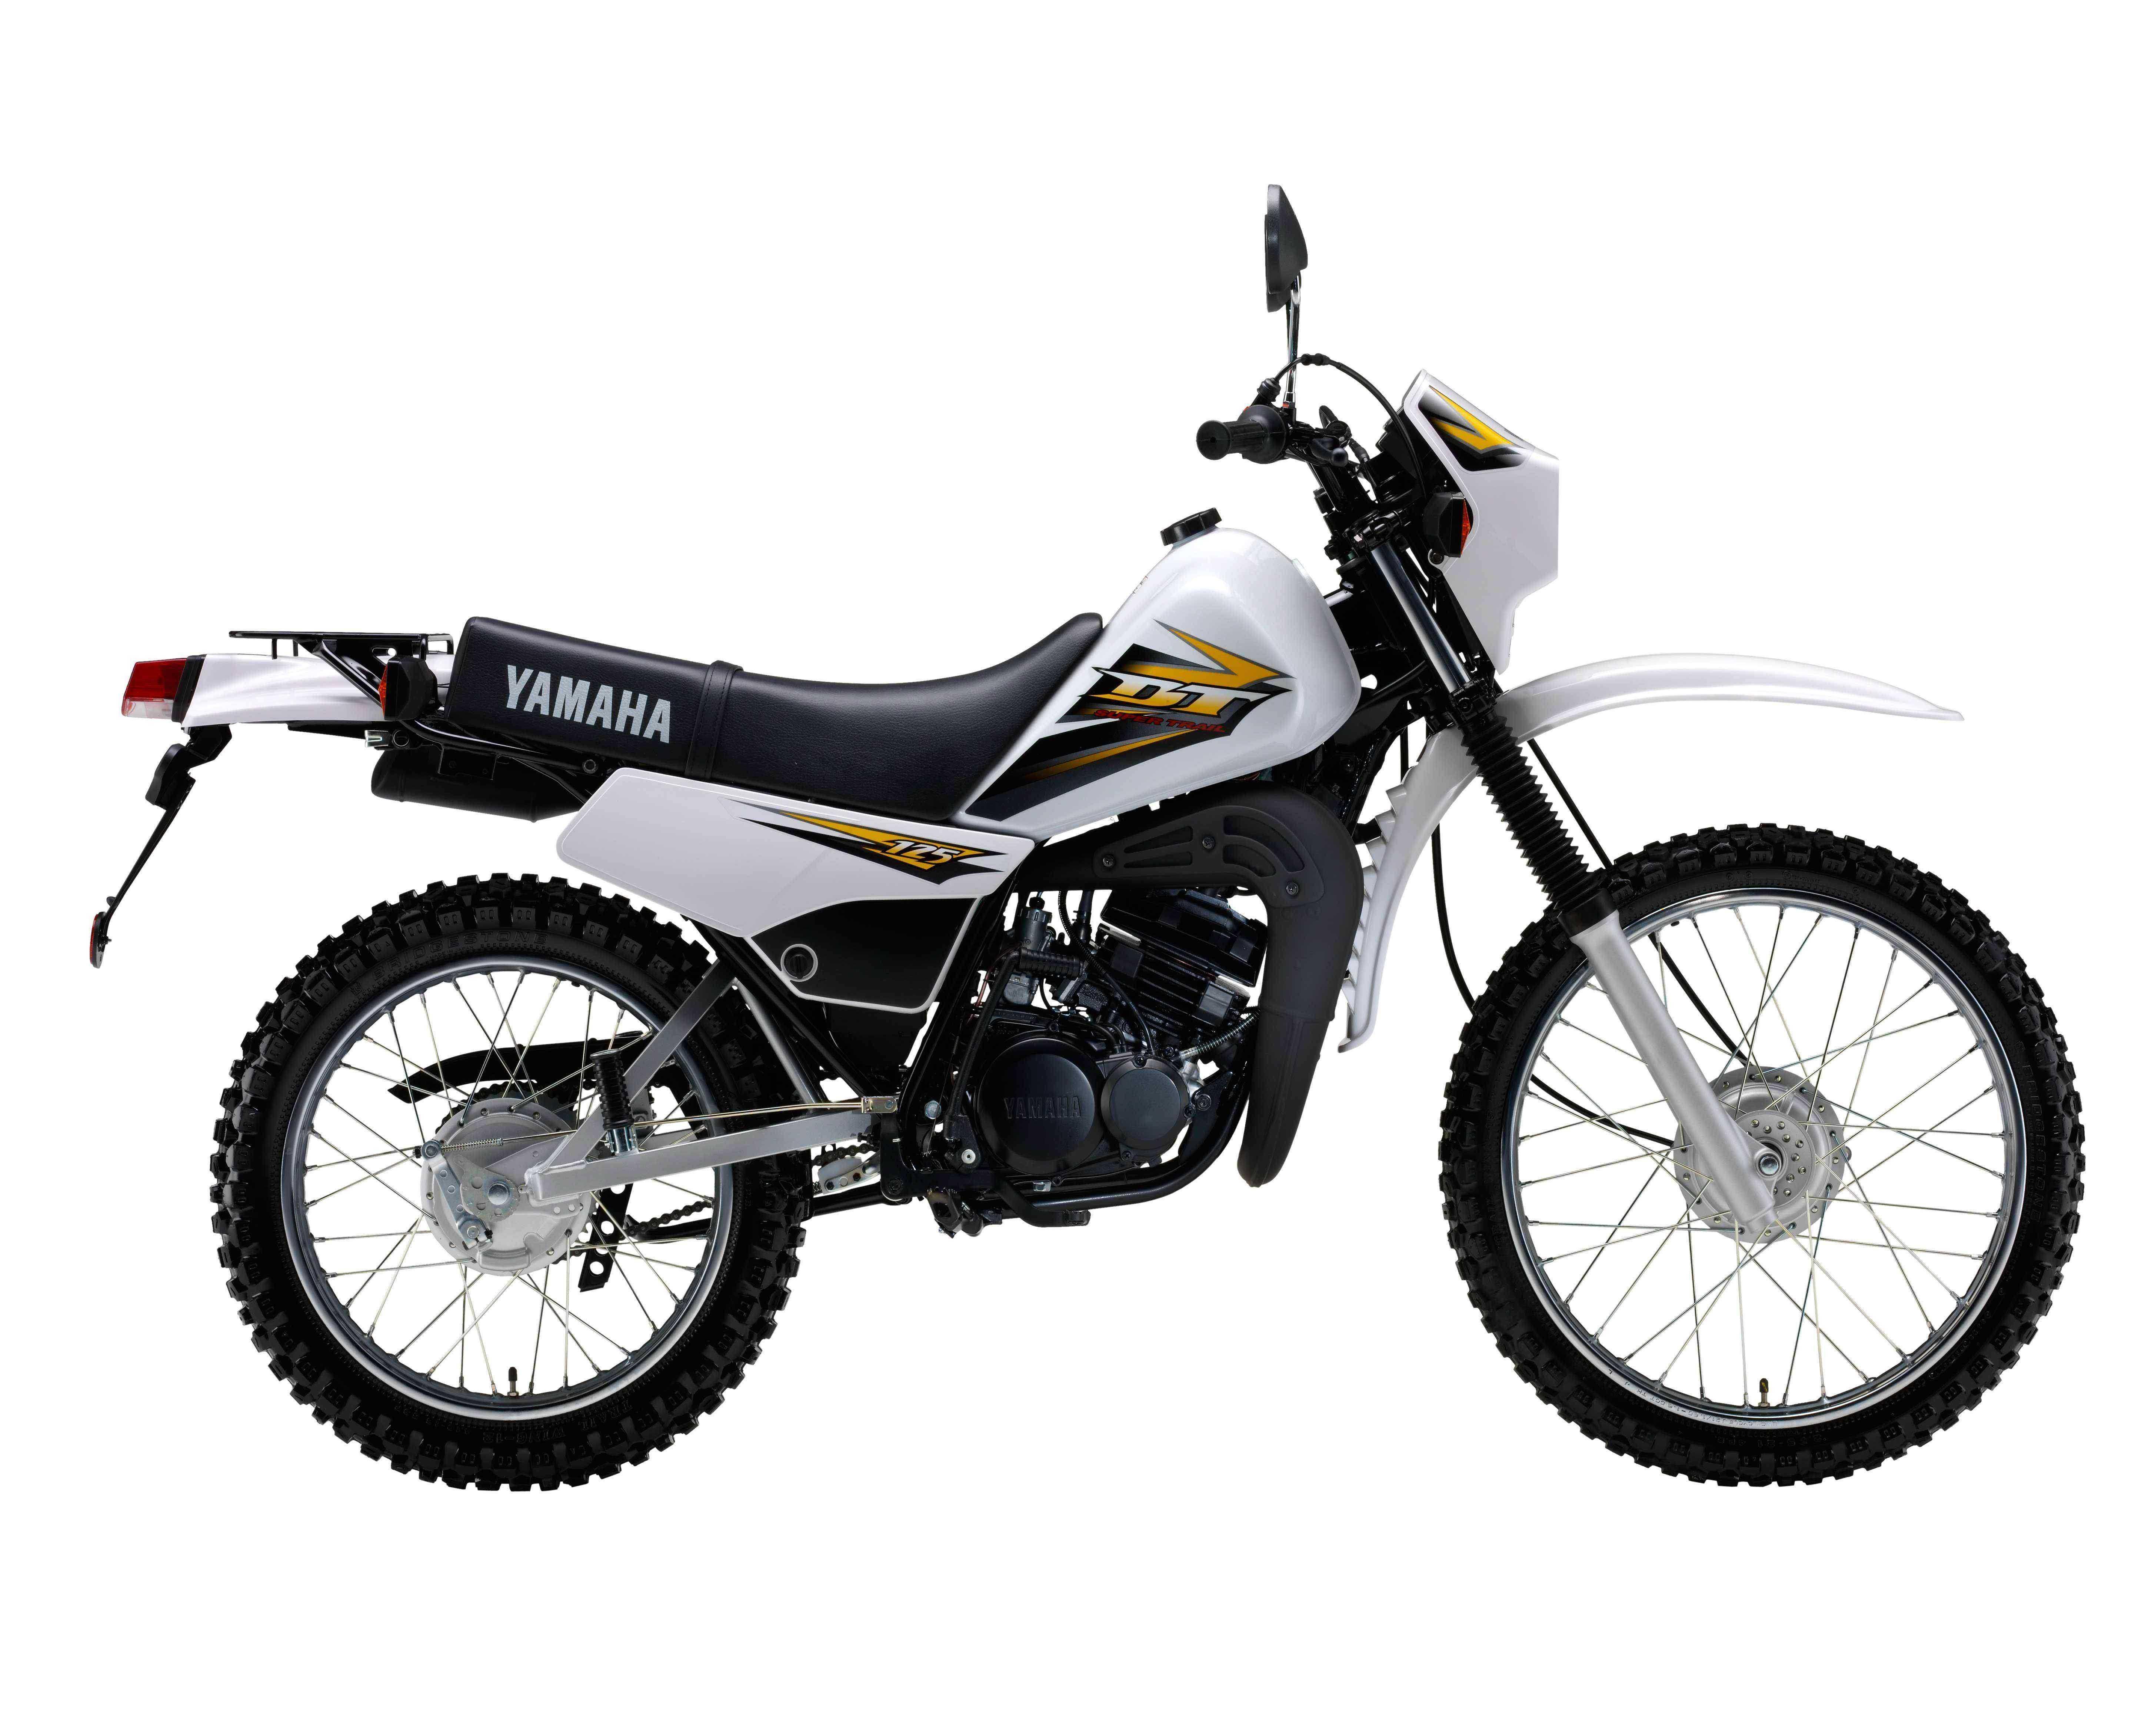 Yamaha 2 Stroke Motorcycle